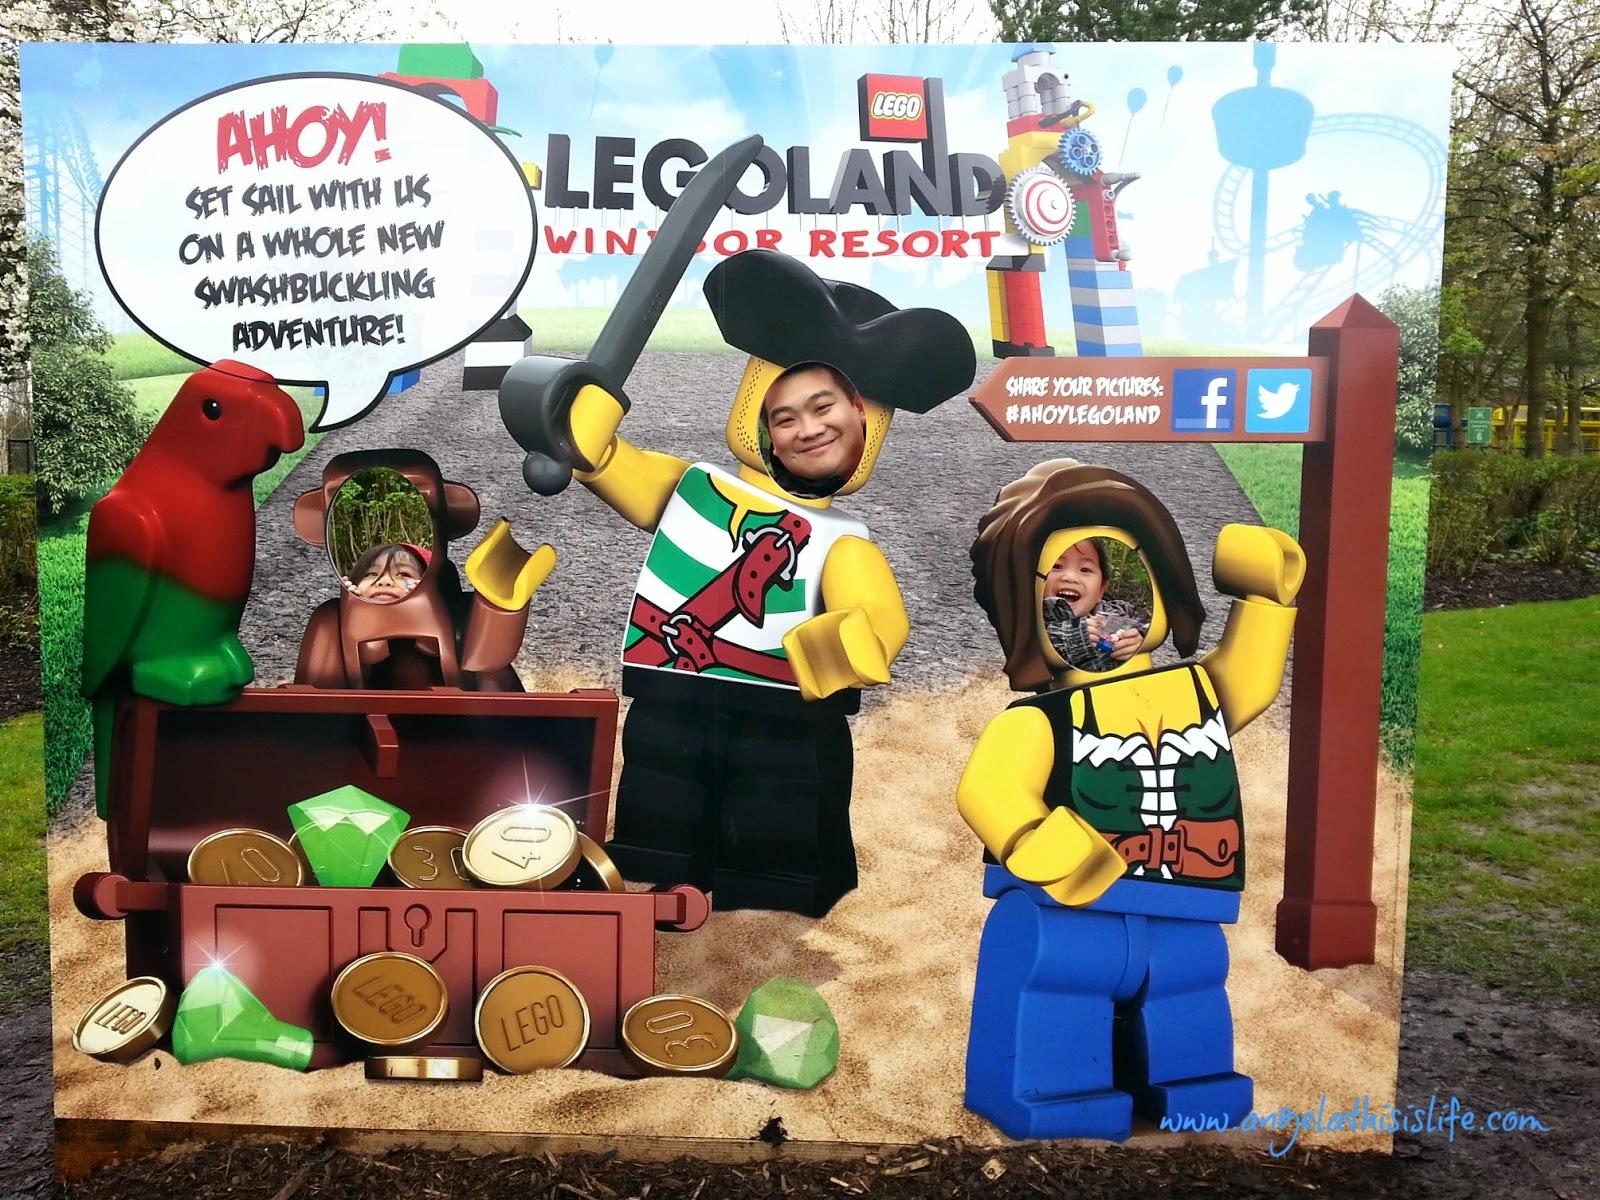 Legoland Windsor 2014, Legoland Windsor Easter, Legoland Windsor Pirate Shores 2014